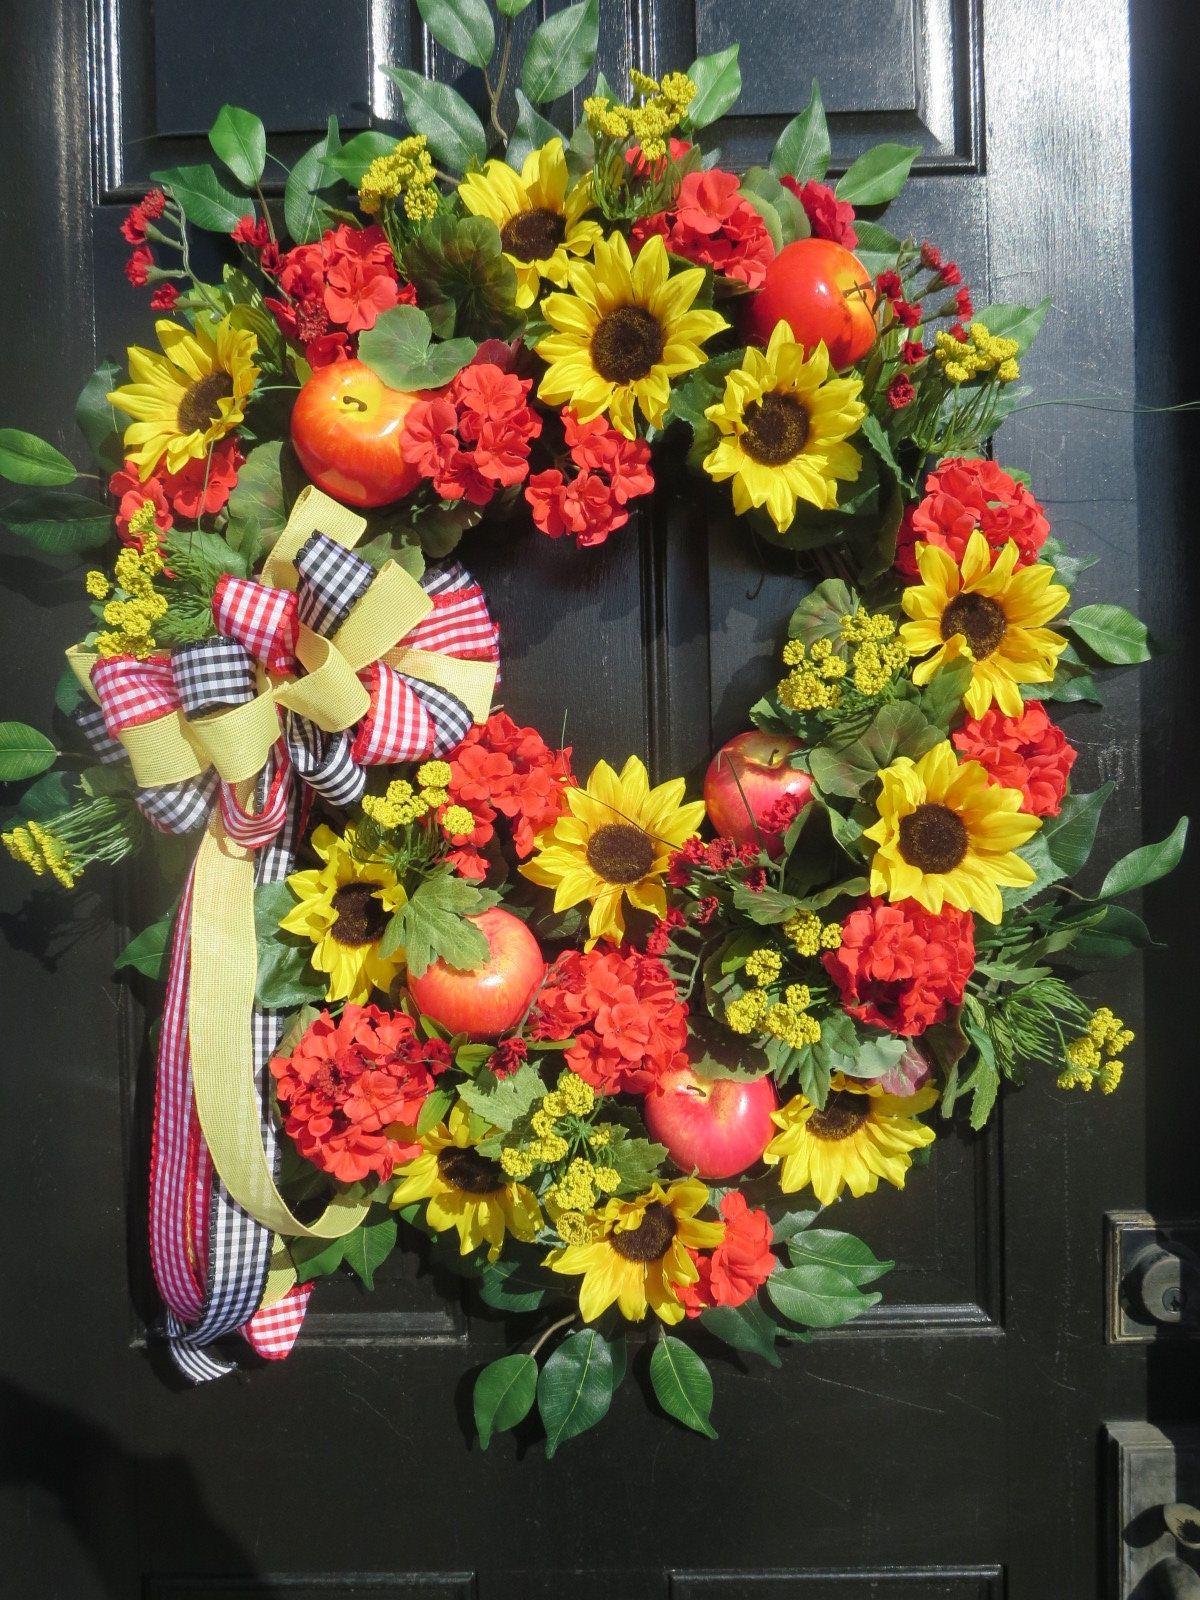 Photo of Farmhouse Door Wreath, XL Sunflower Wreath, Spring Door Wreath, Summer Wreath Front Door, Country Door Decor